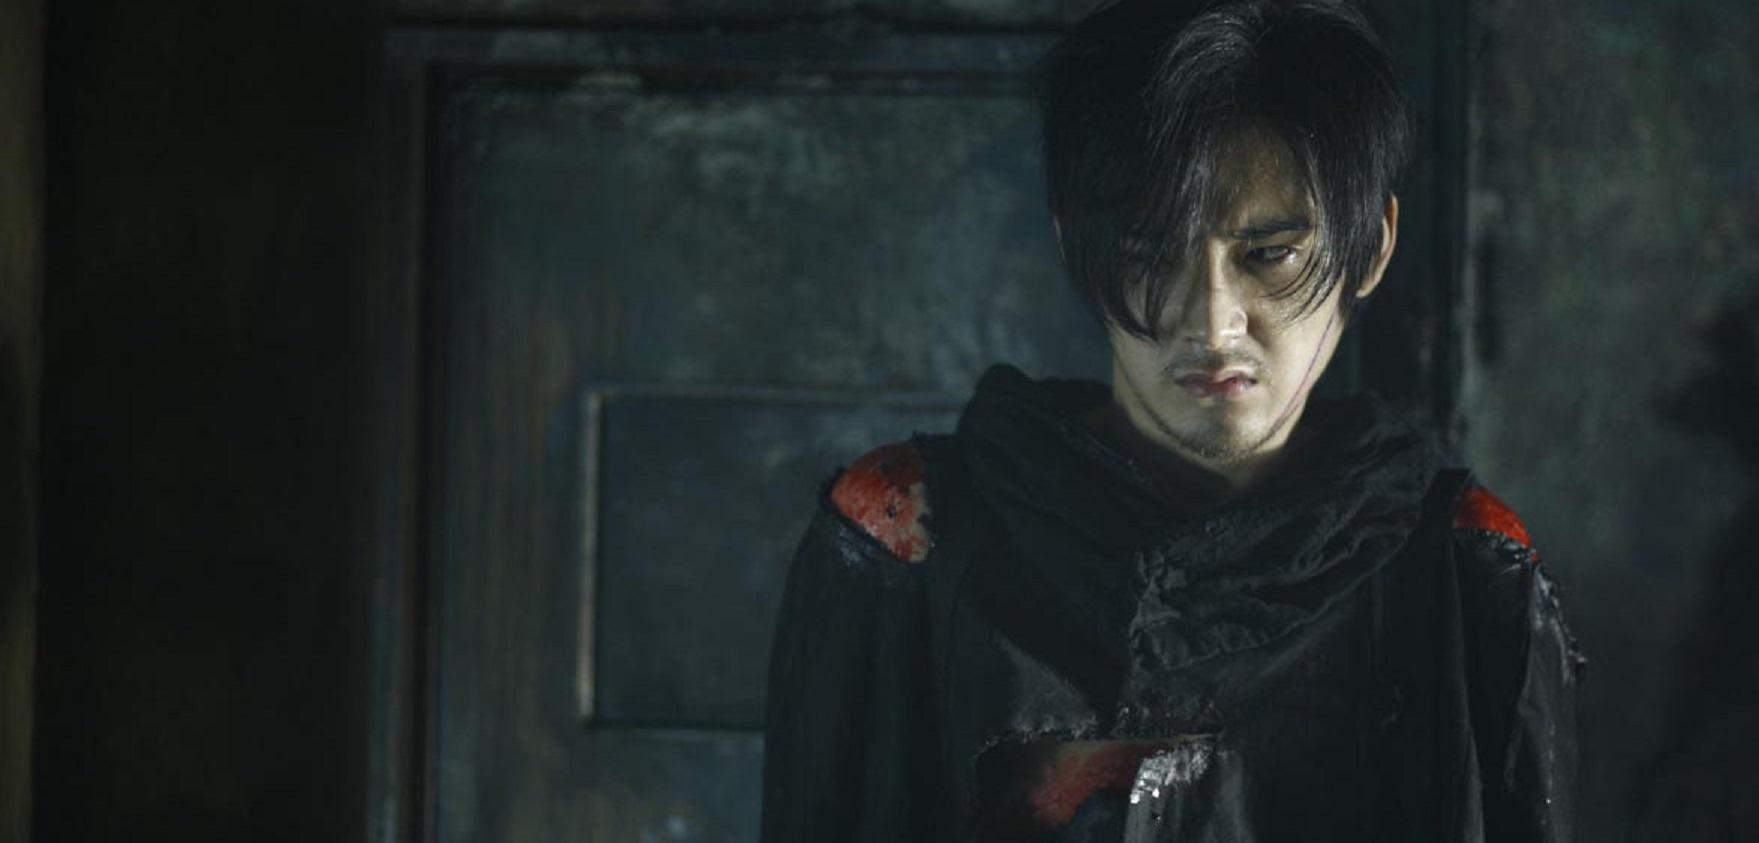 Ryuhei Matsuda as Kagenuma, The Nightmare Detective